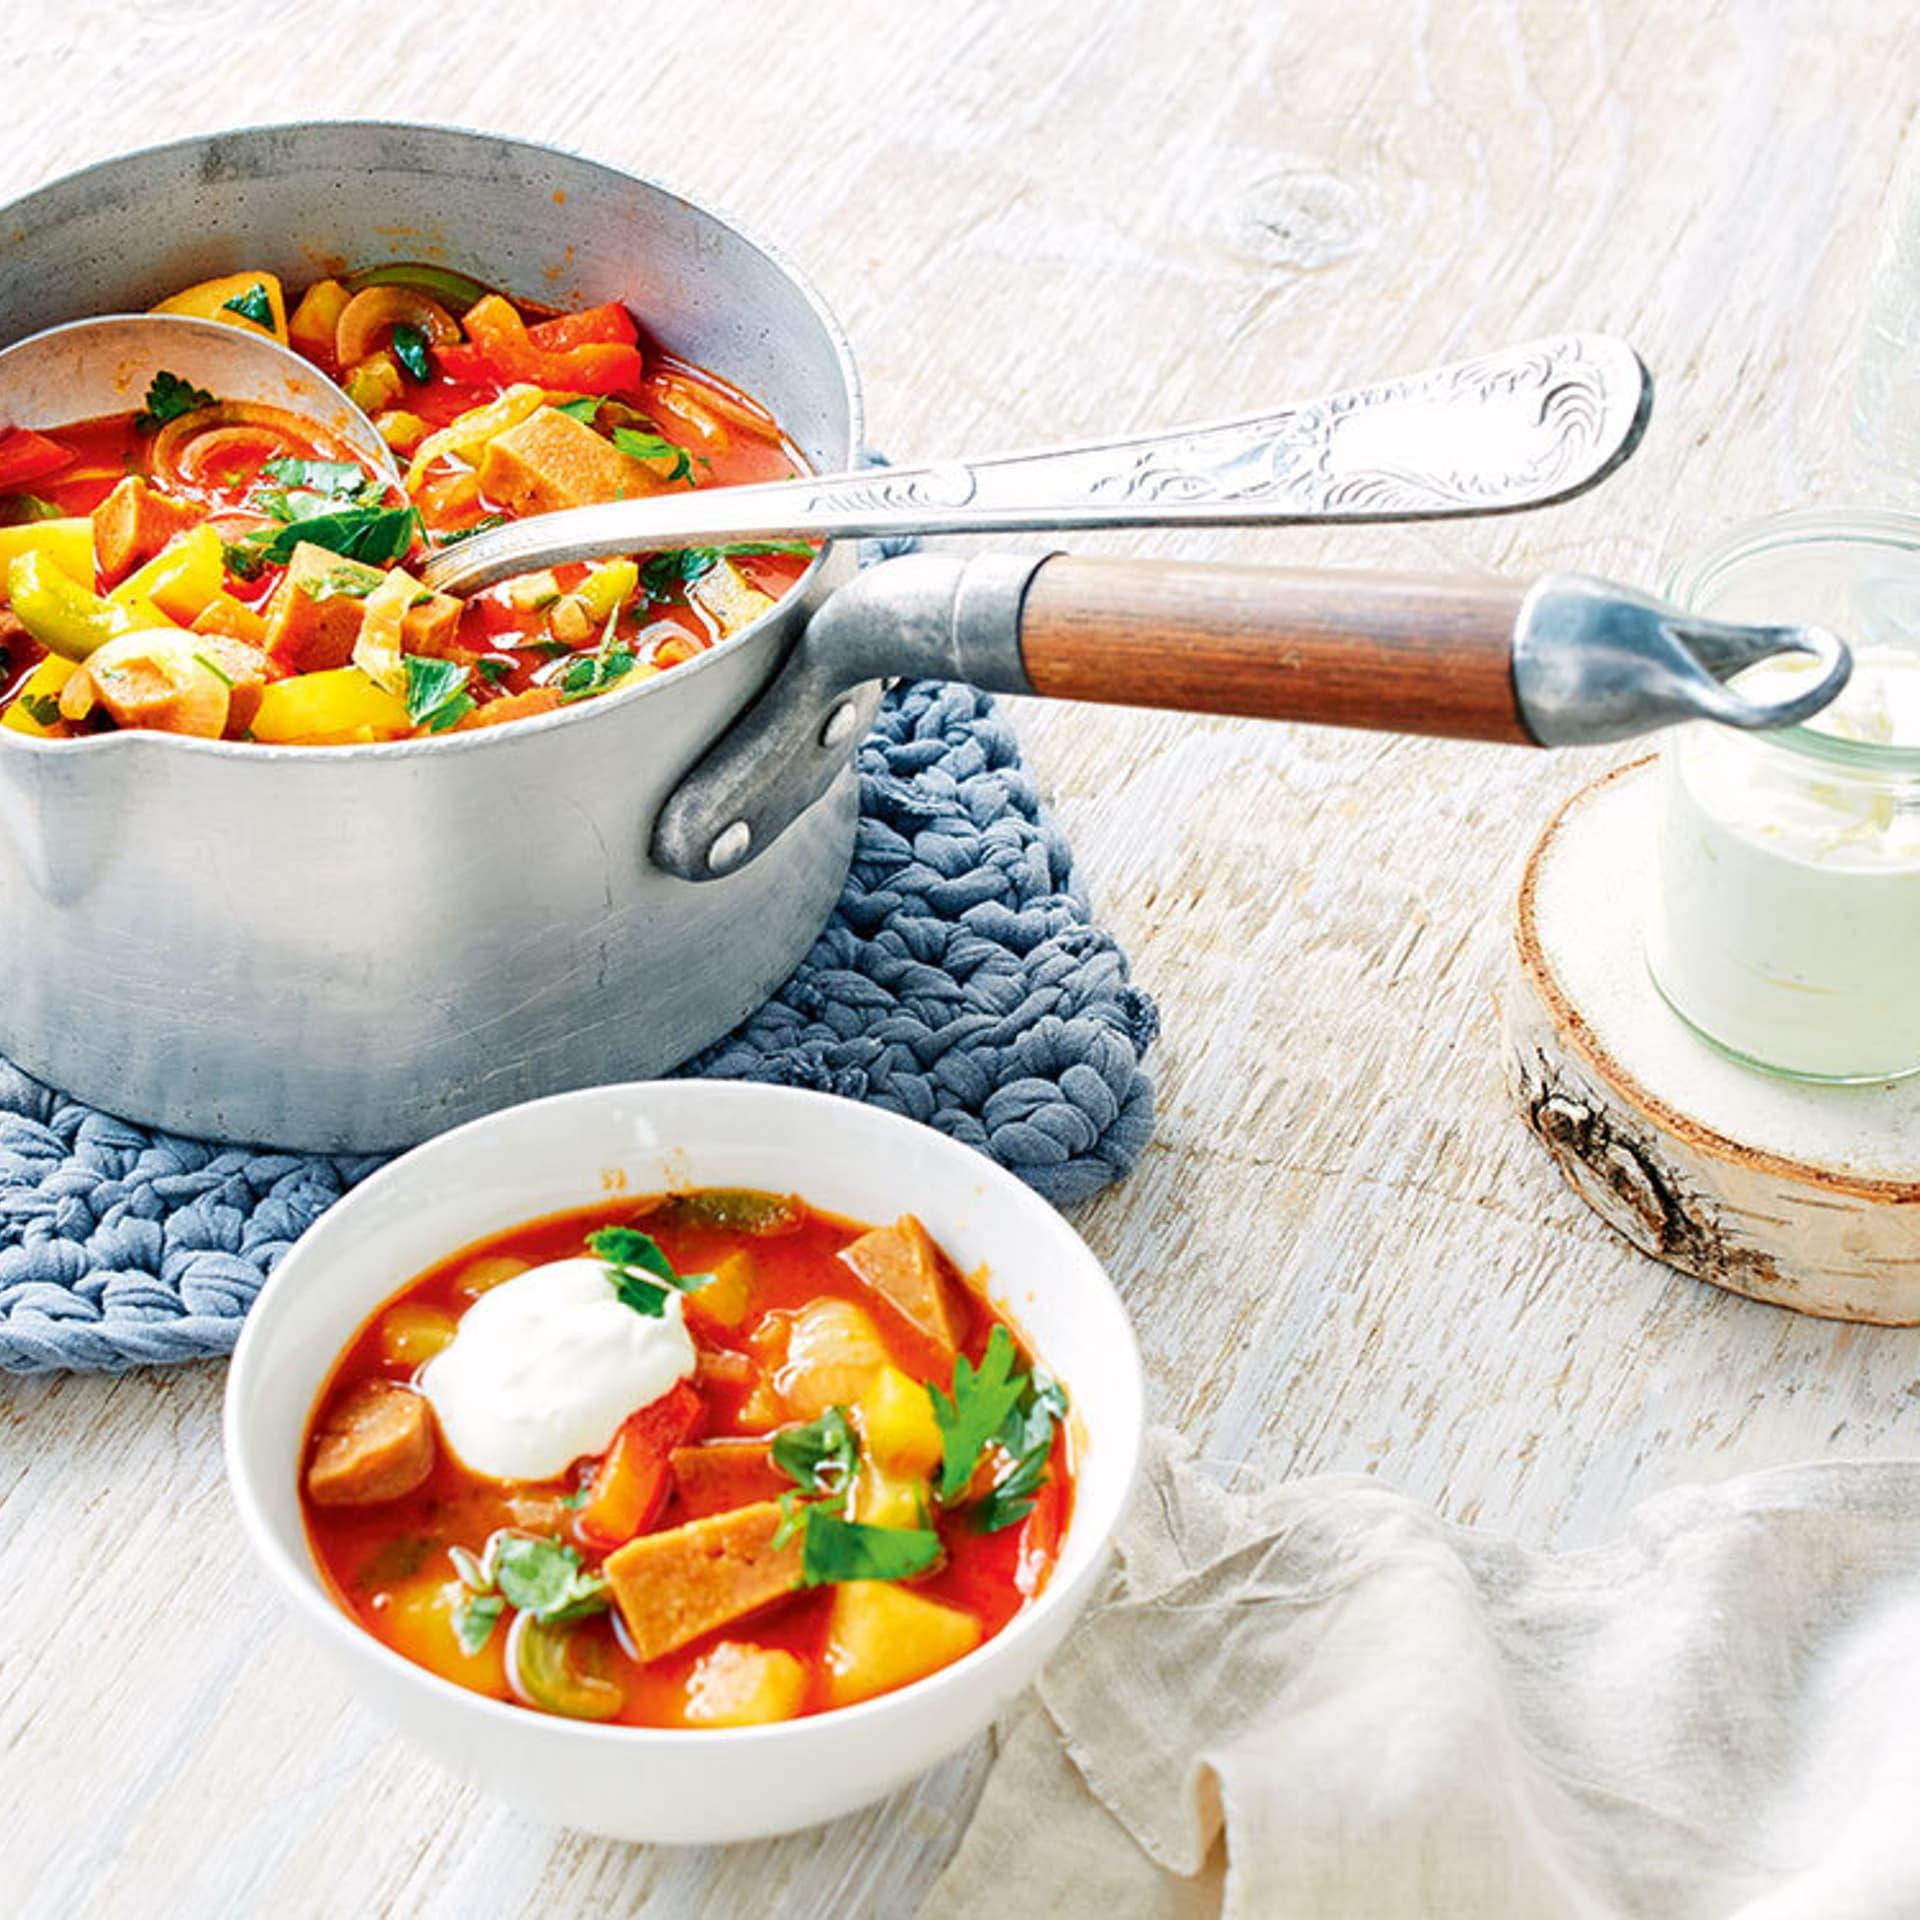 Paprika-Seitan-Kartoffelgulasch